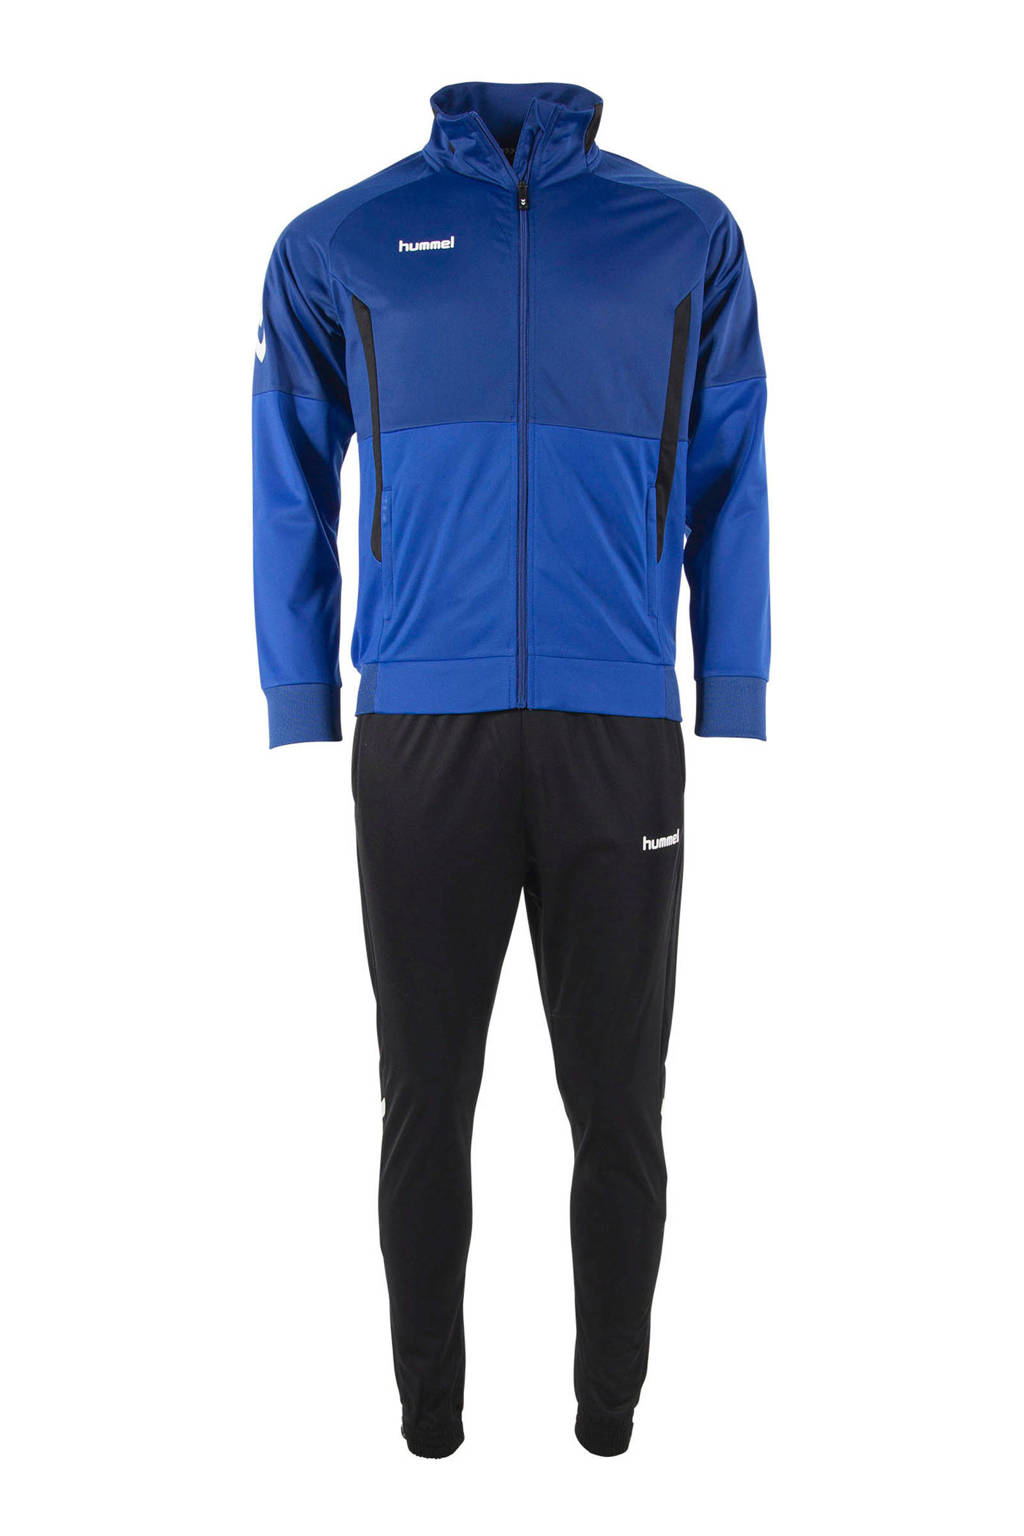 hummel Junior  trainingspak blauw/zwart, Blauw/zwart